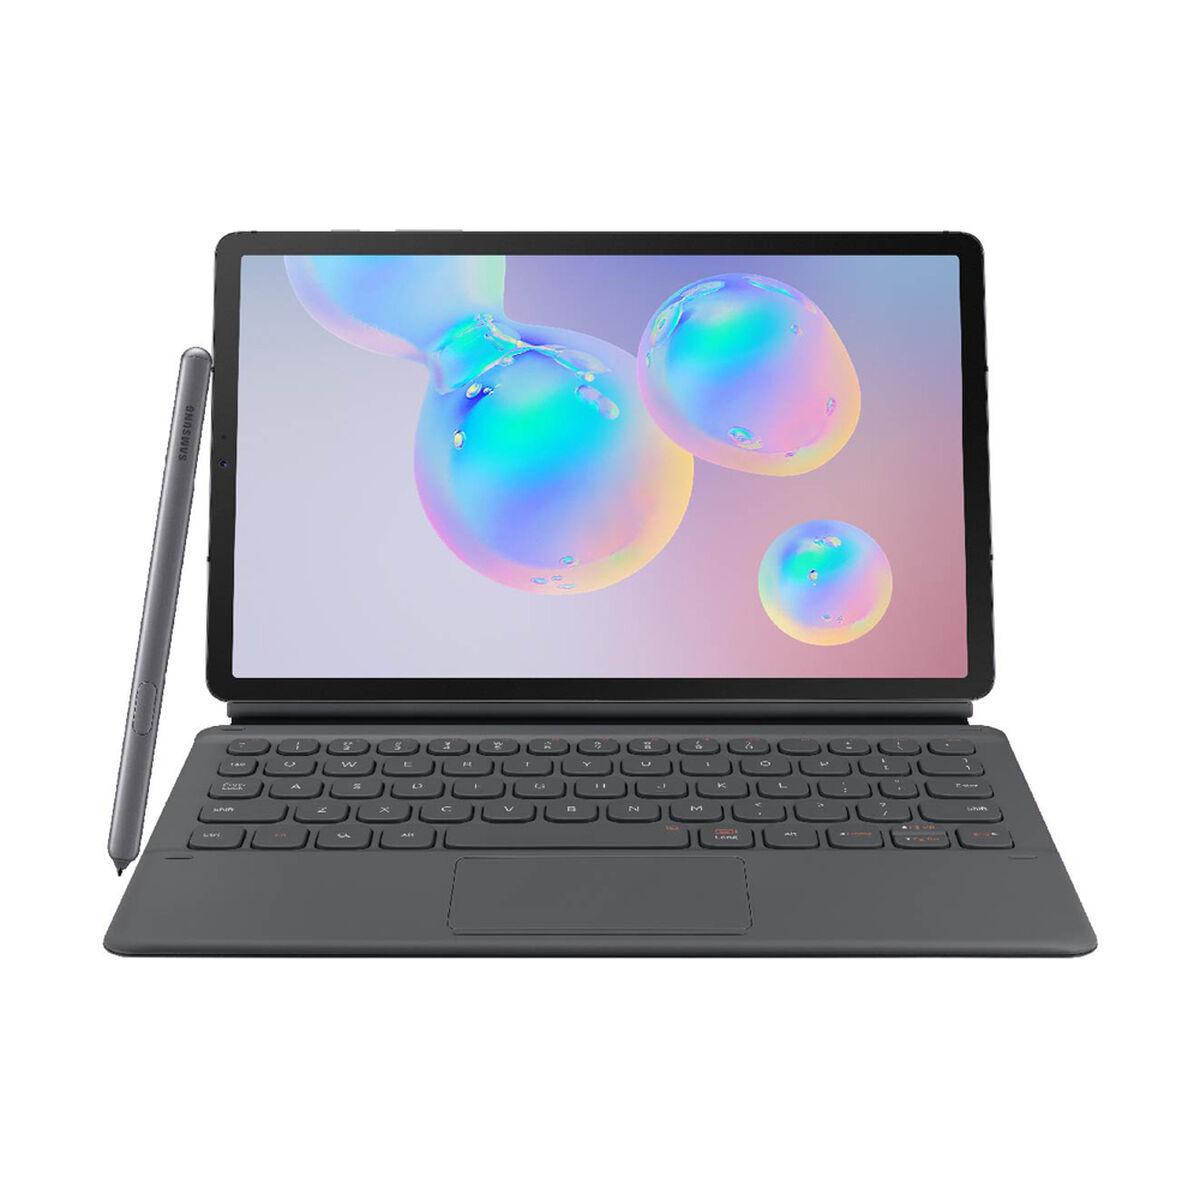 "Tablet Samsung S6 Octa Core 6GB 128GB 10,5"" Gris Wi-Fi + Keyboard + S Pen"